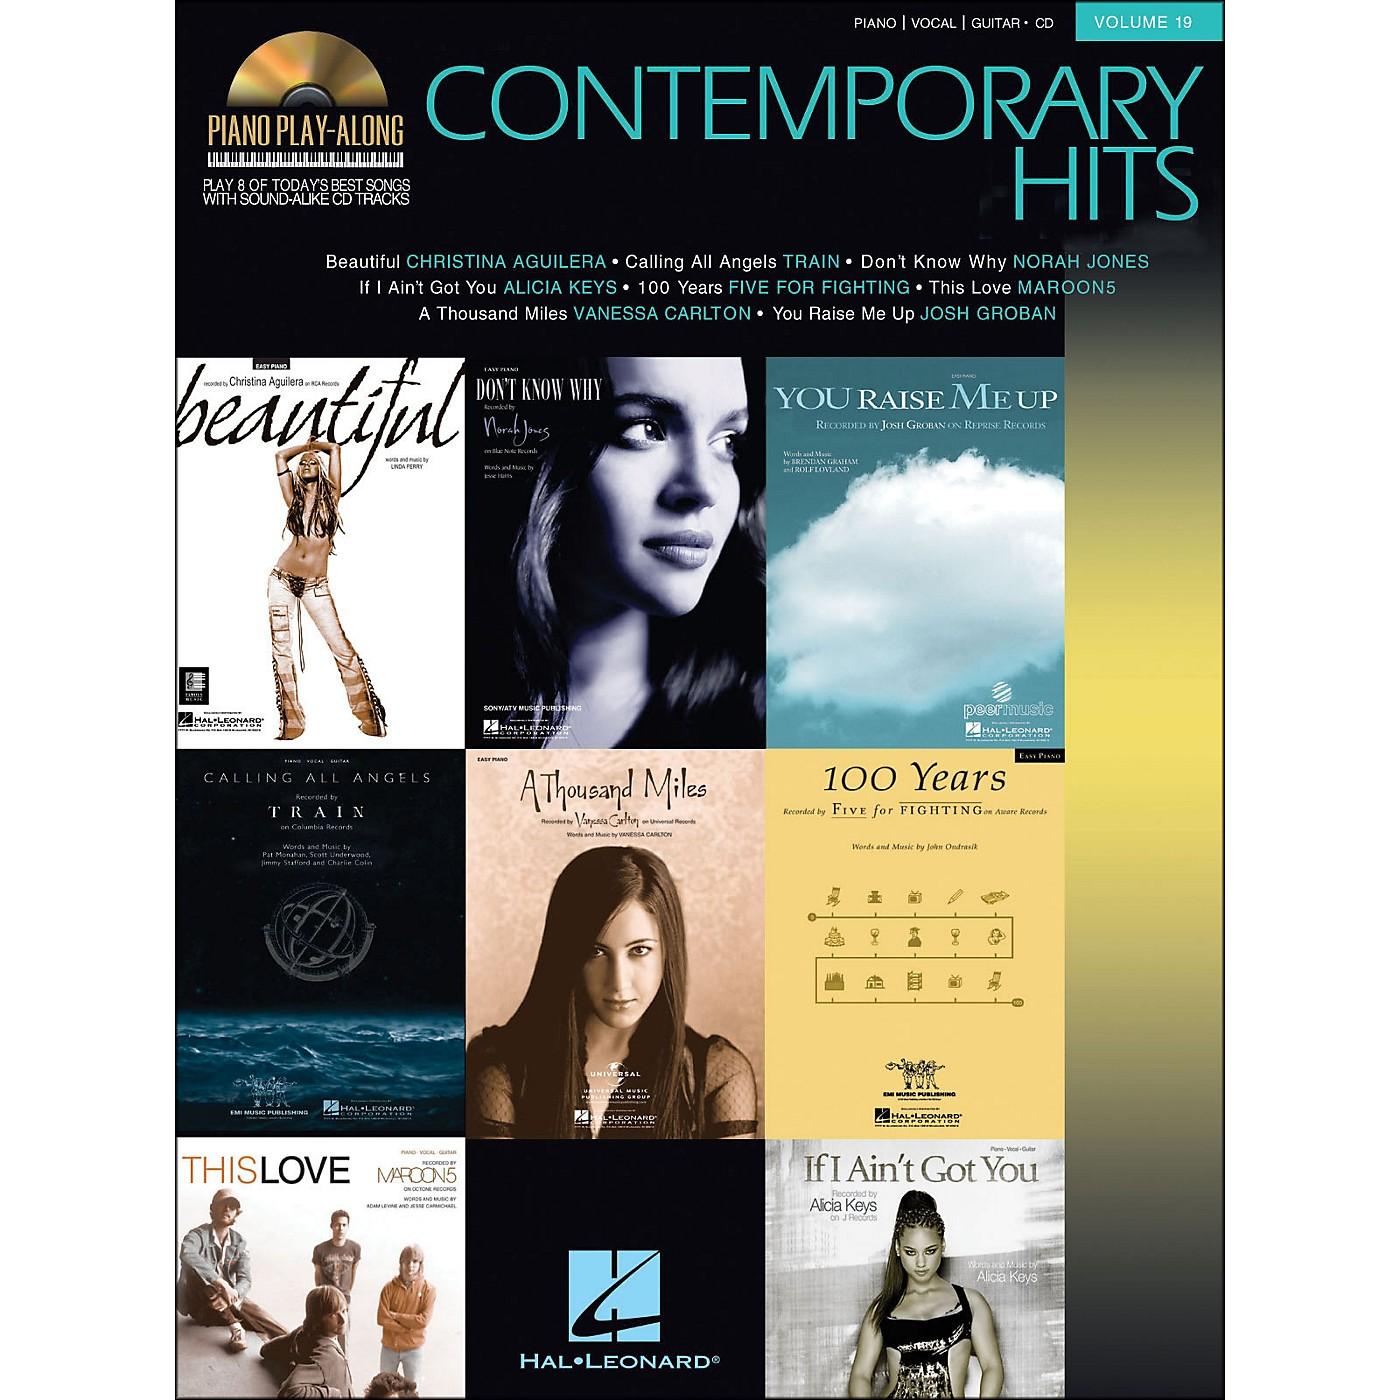 Hal Leonard Contemporary Hits Volume 19 Book/CD Piano Play-Along arranged for piano, vocal, and guitar (P/V/G) thumbnail